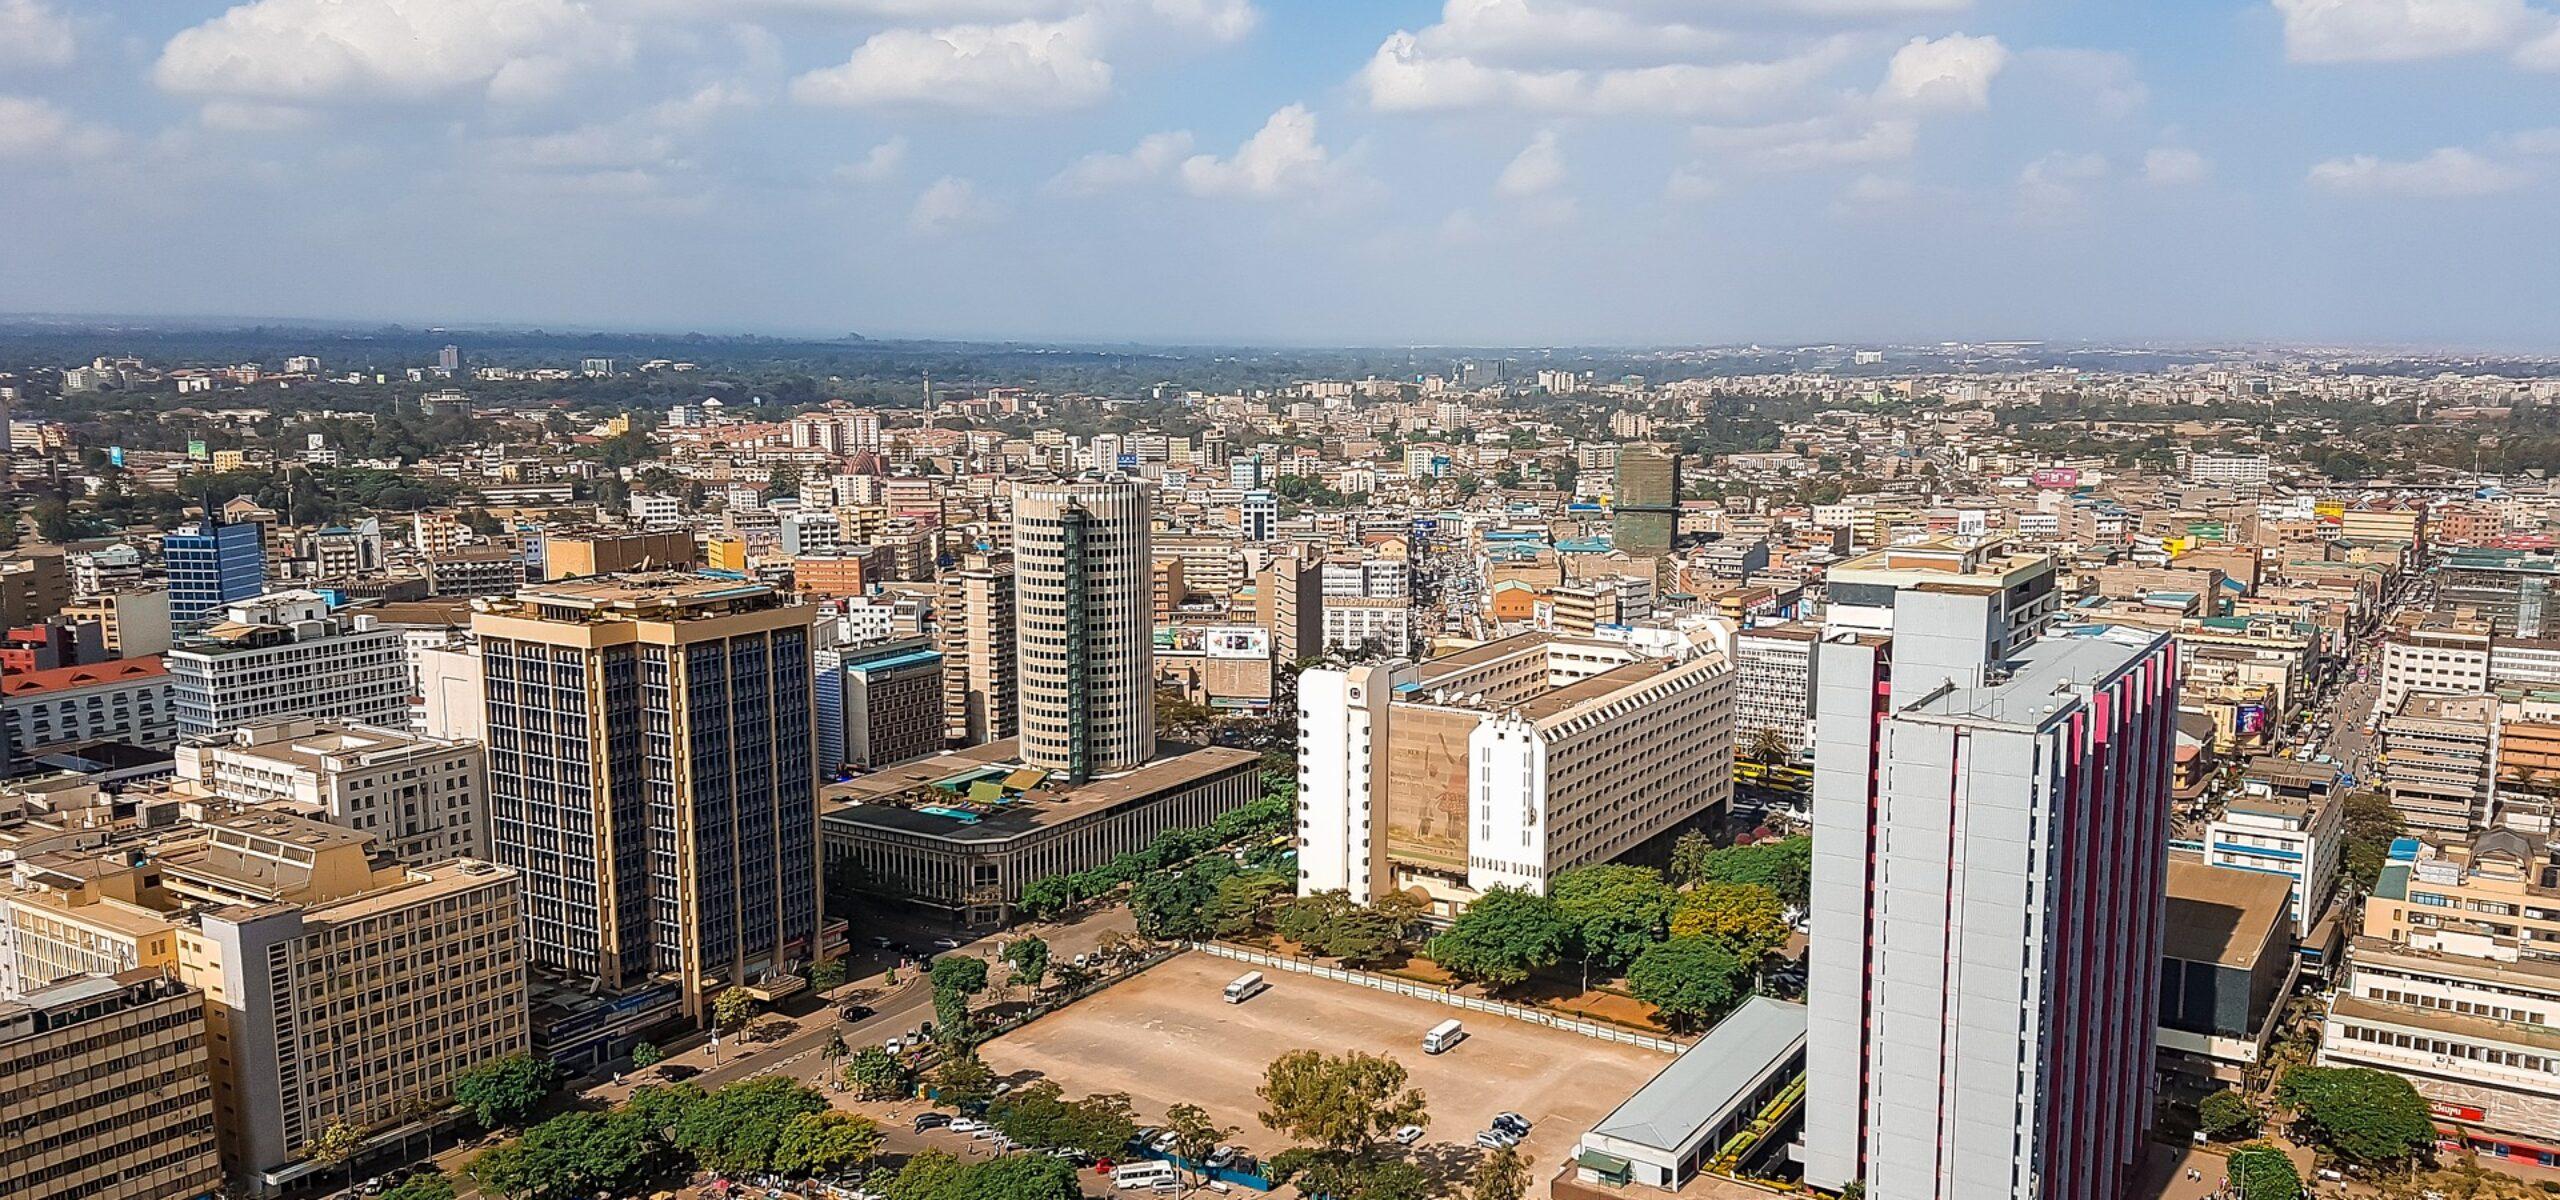 Kenya cityscape